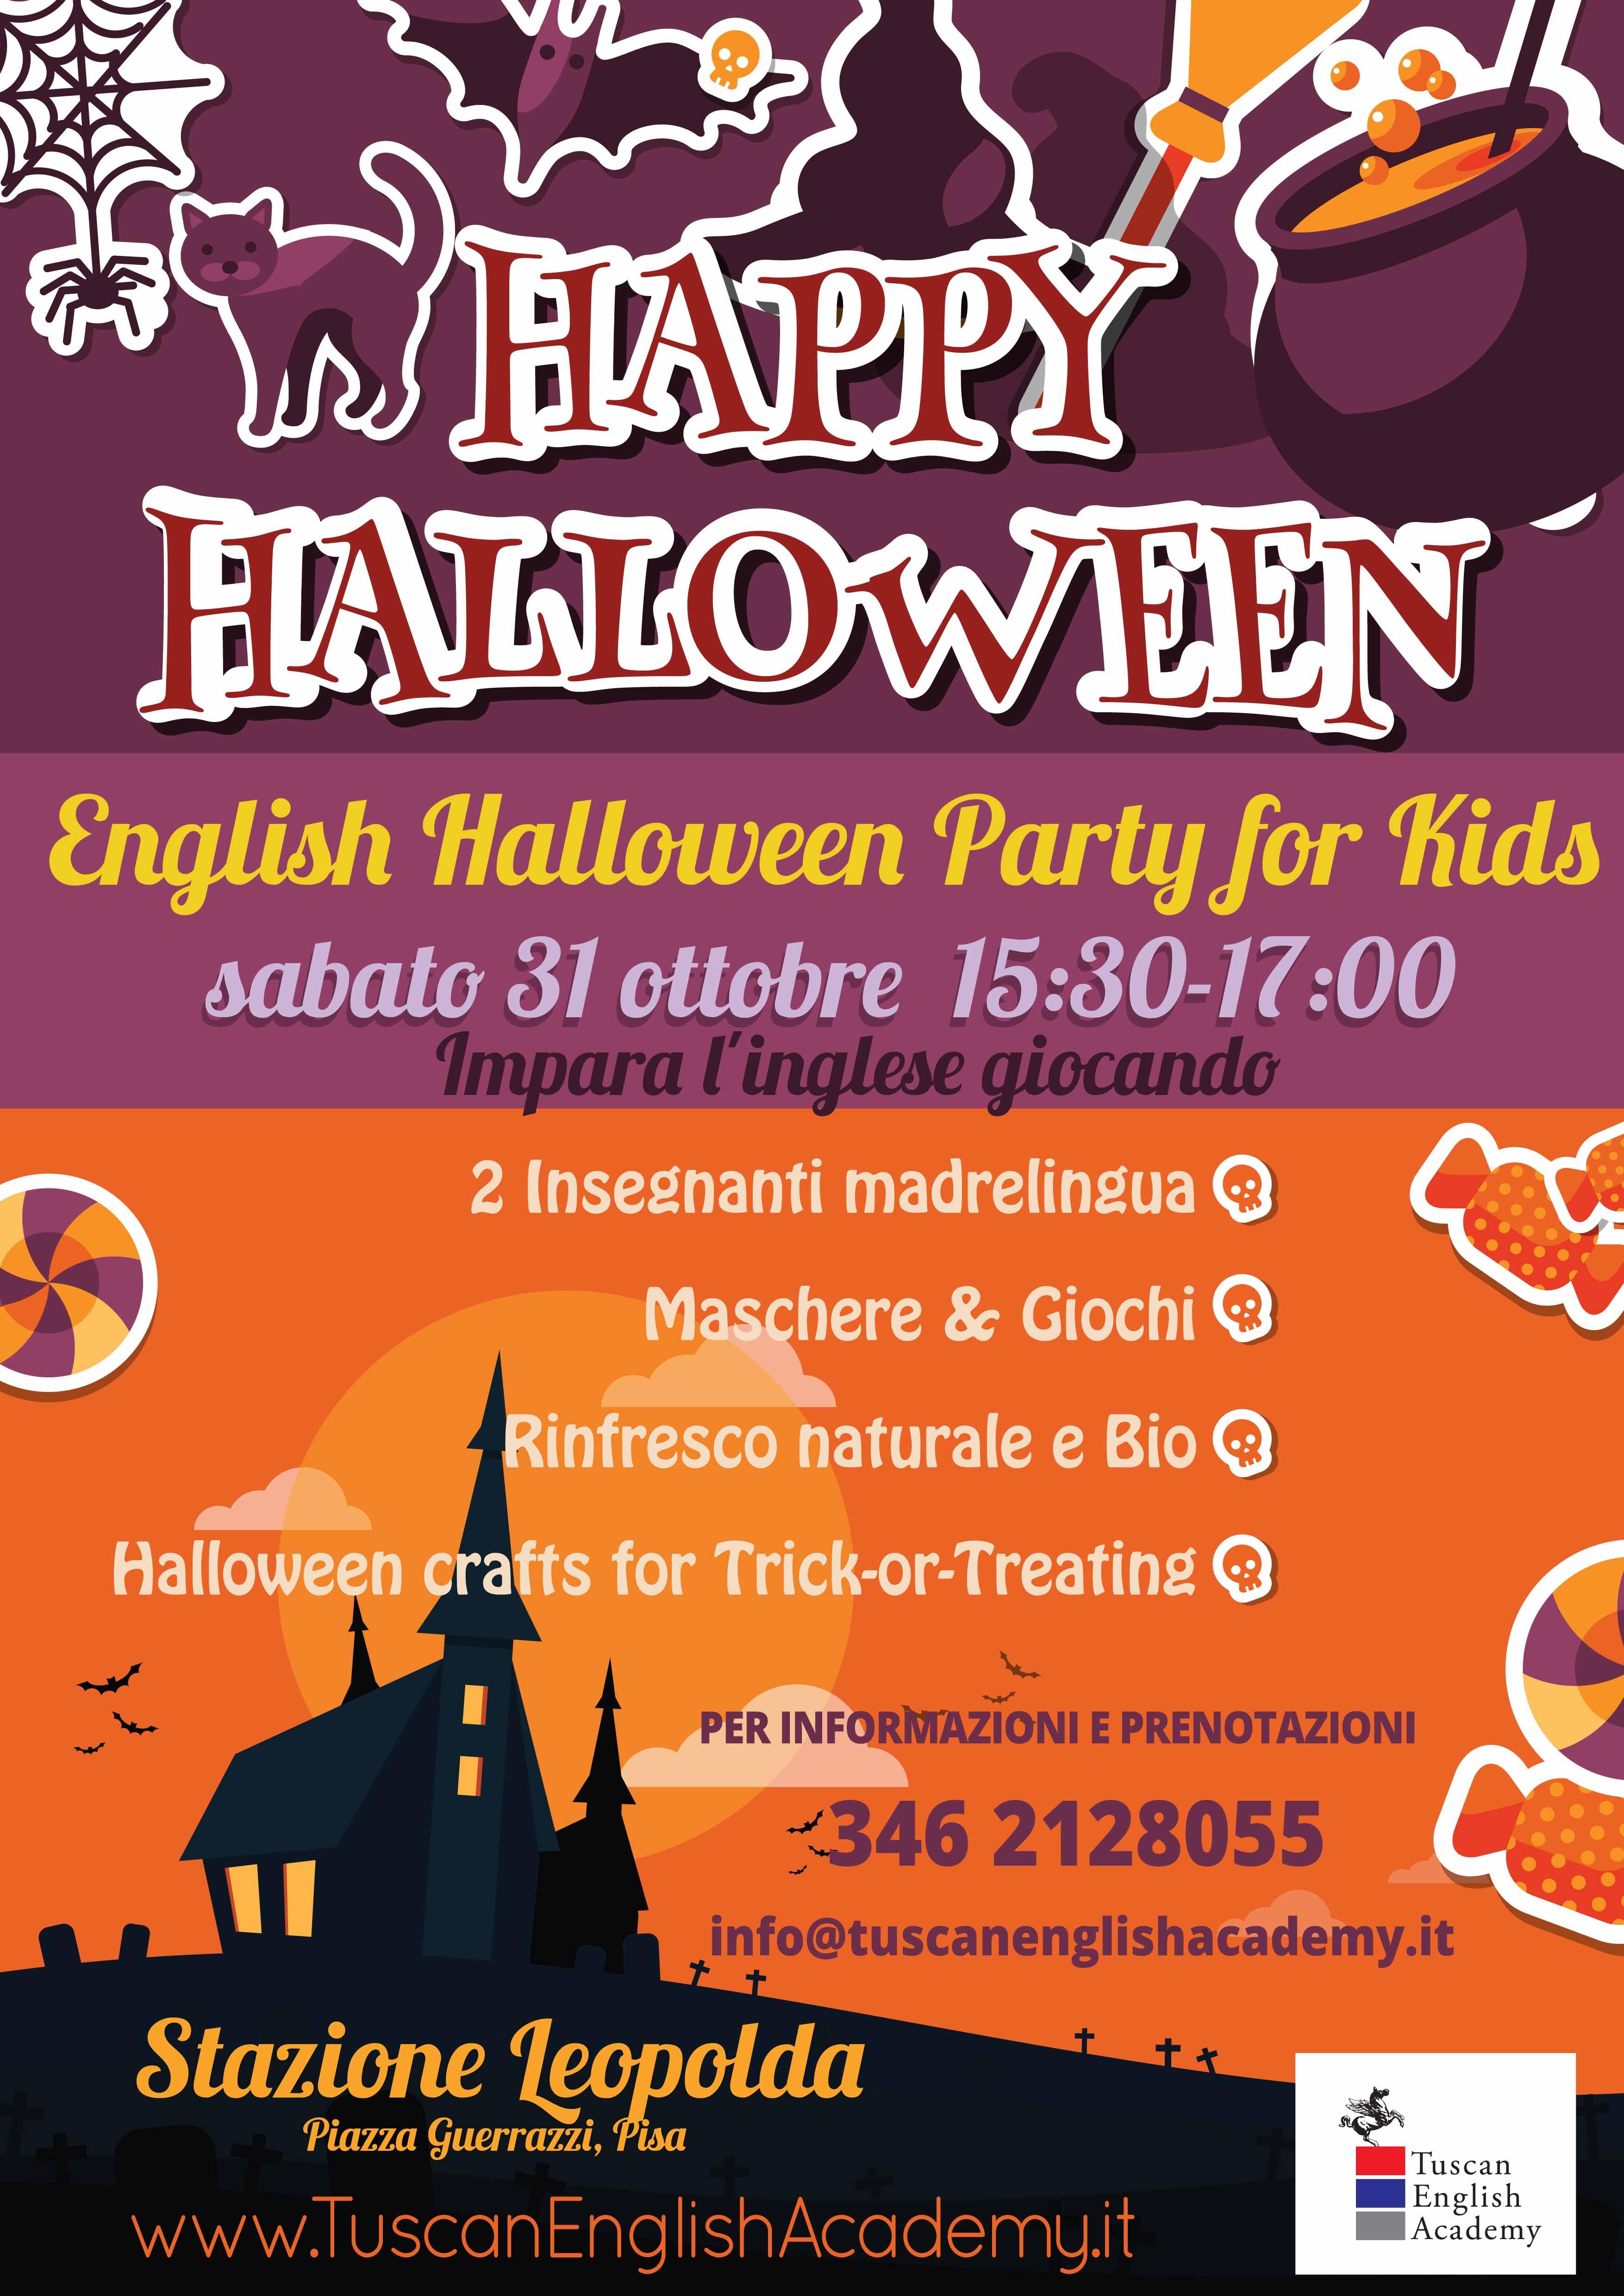 English Halloween Party for Children!  (Stazione Leopolda) - NEW ... b1906aa51212